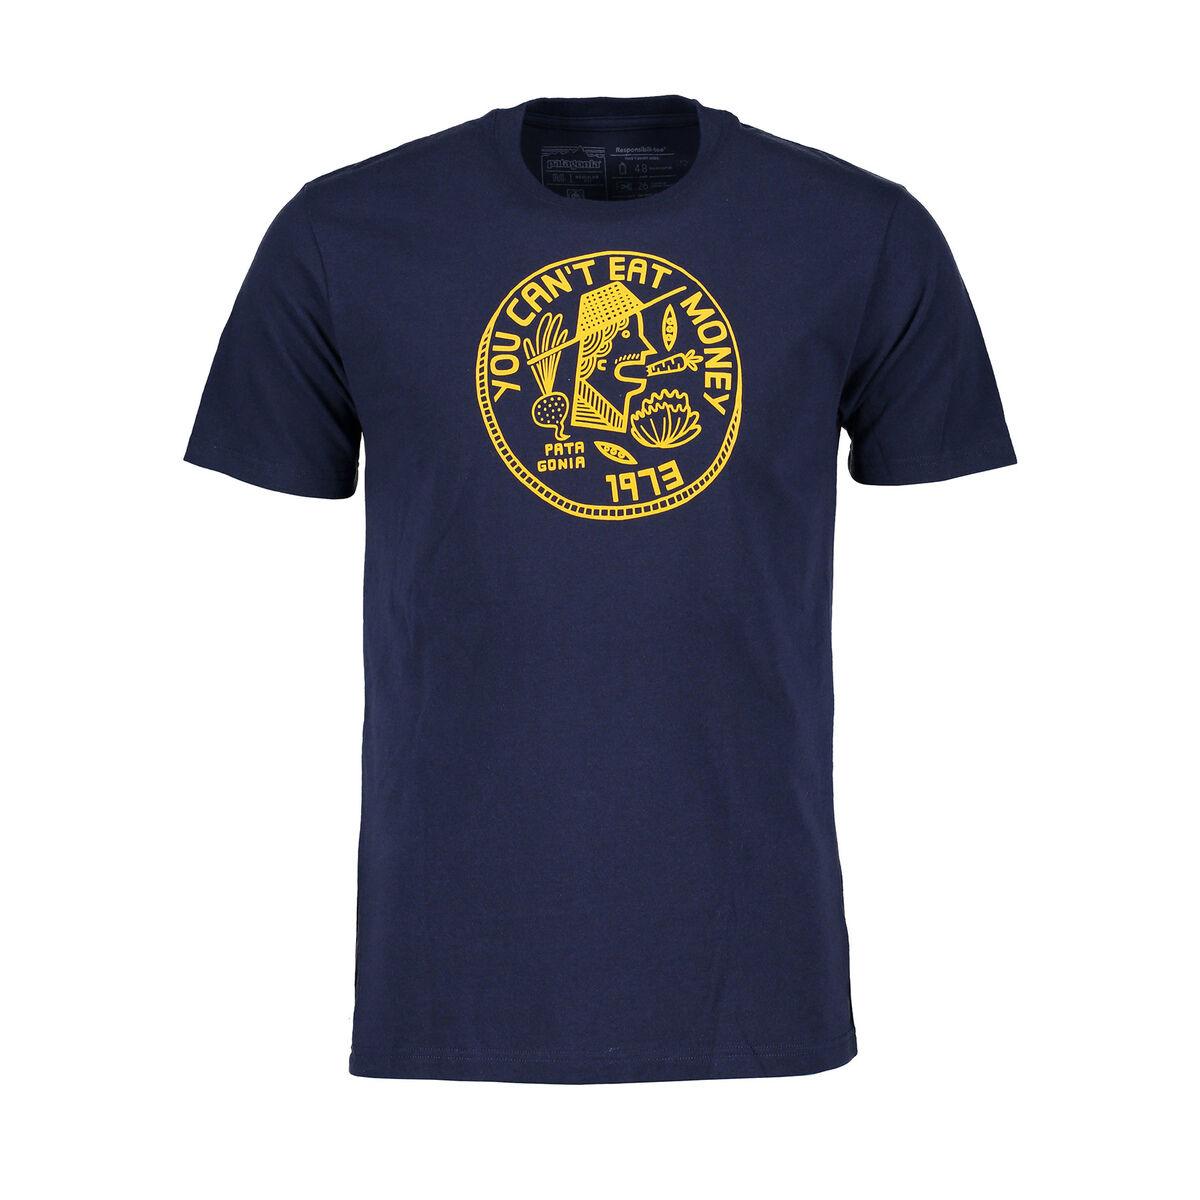 Patagonia T-shirt can't eat money responsibili-tee®